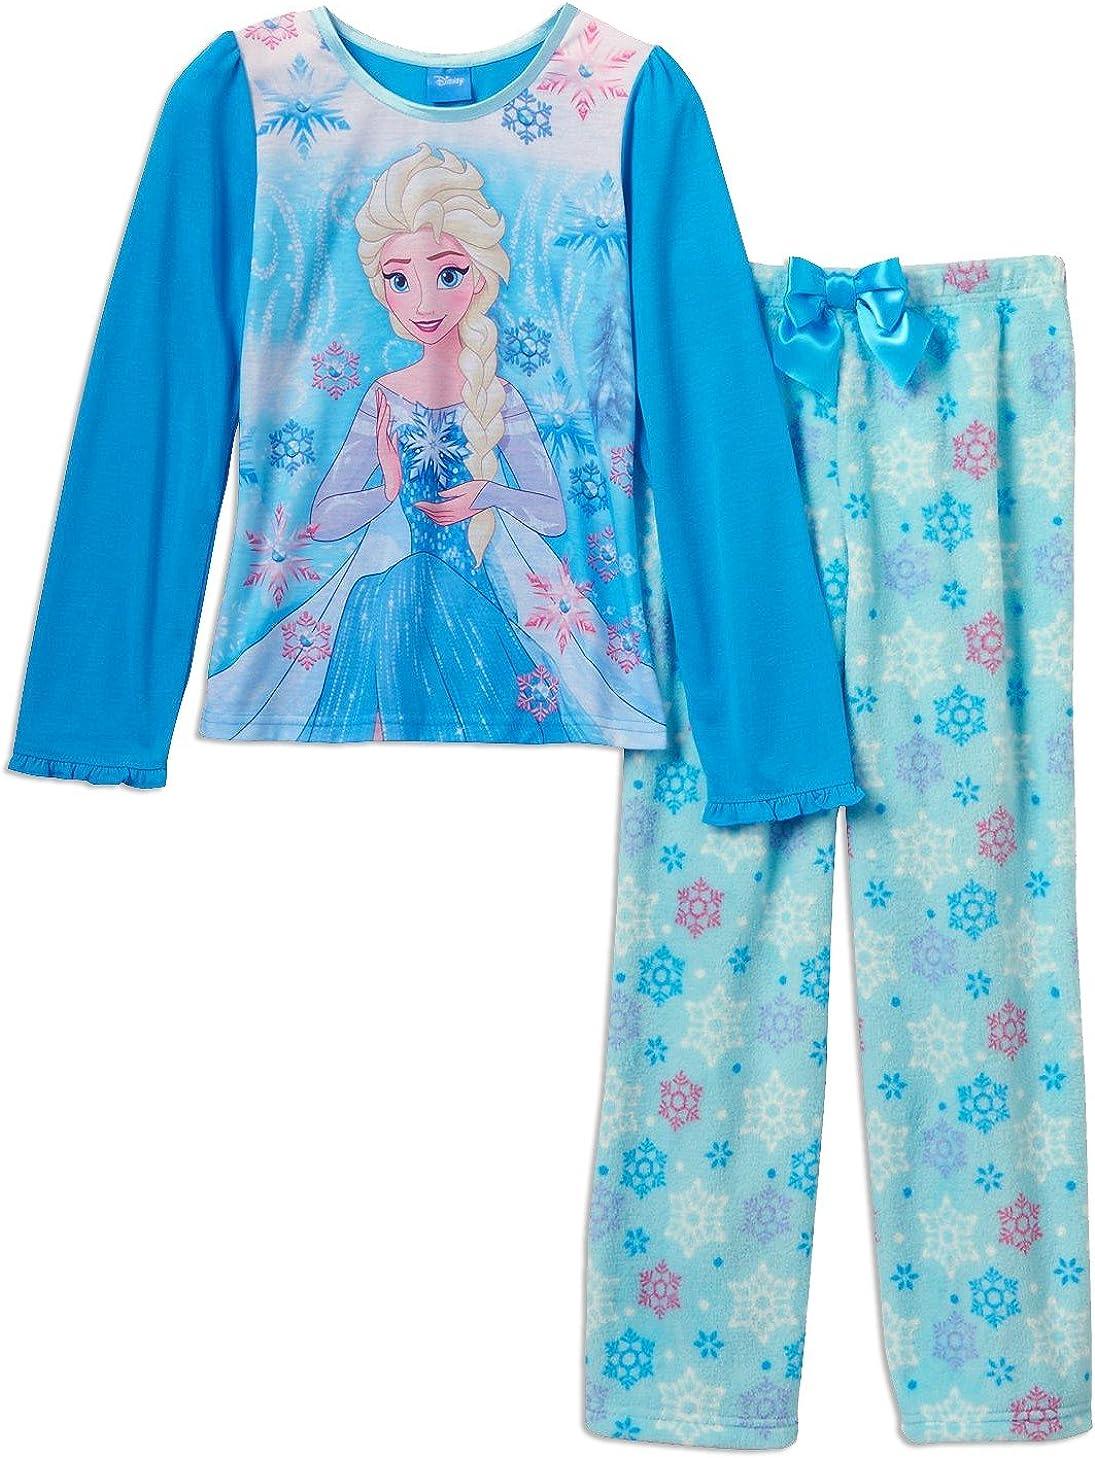 Frozen Elsa Anna Girls Poly Top Fleece Pants Pajamas, Sizes 4-10